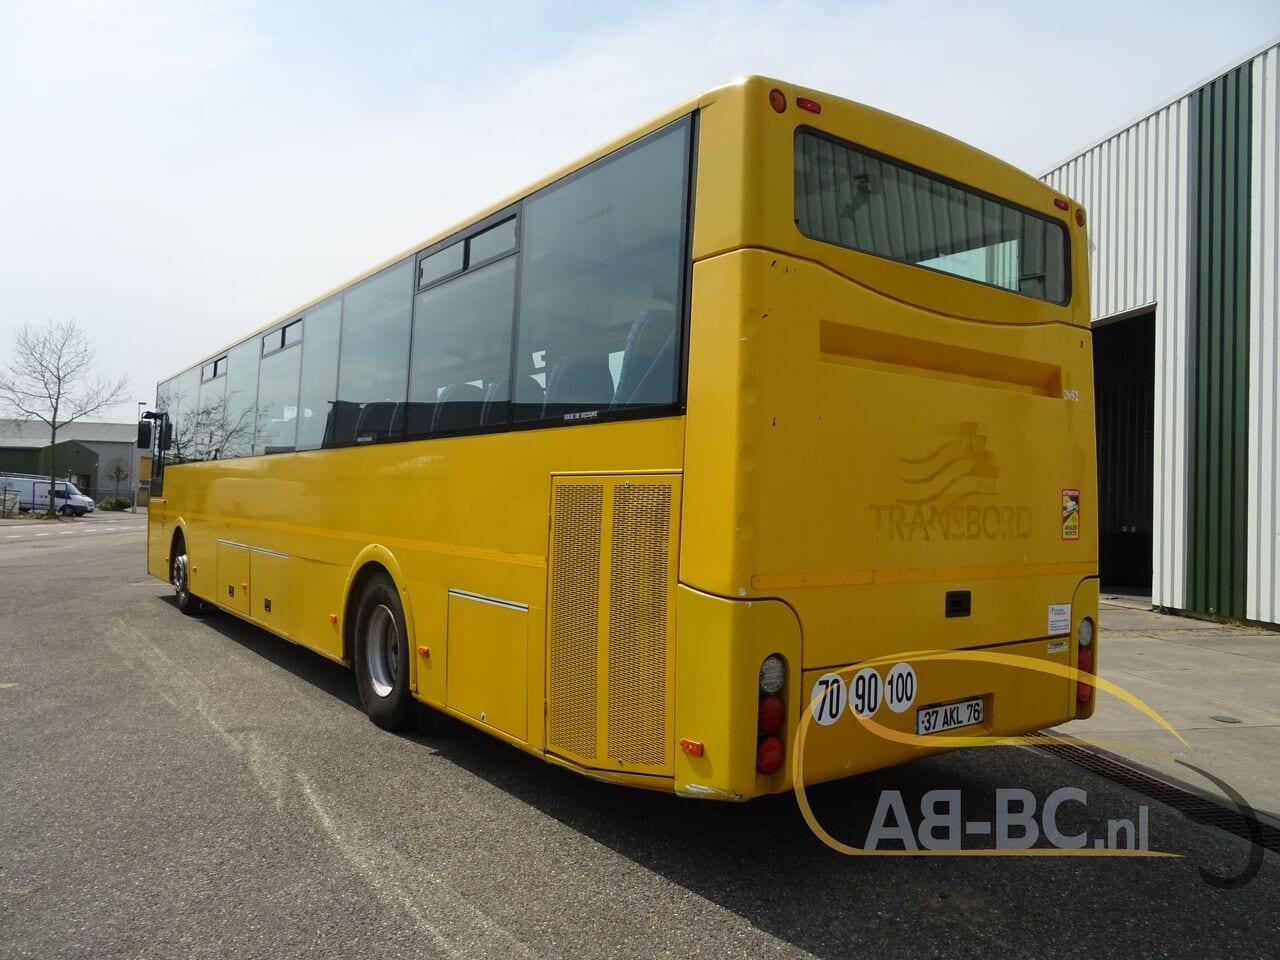 interurban-busMAN-Fast-64-seats---1619619729013080354_big_e2e41b44ea1f0ea2f785a288664e61b0--21042817163019598600